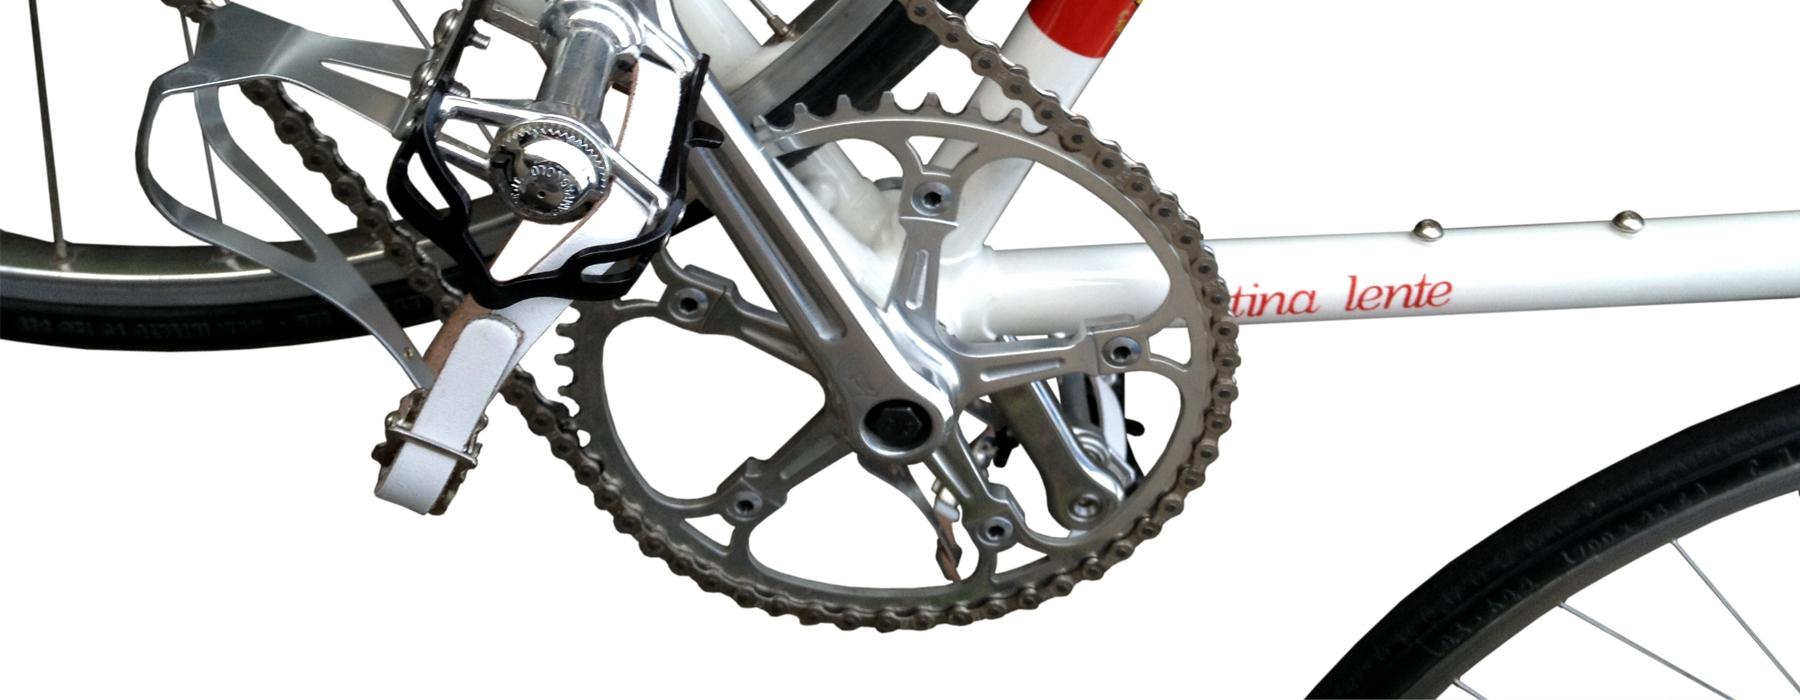 de curae | italian steel bike – Thorsten Schlesinger